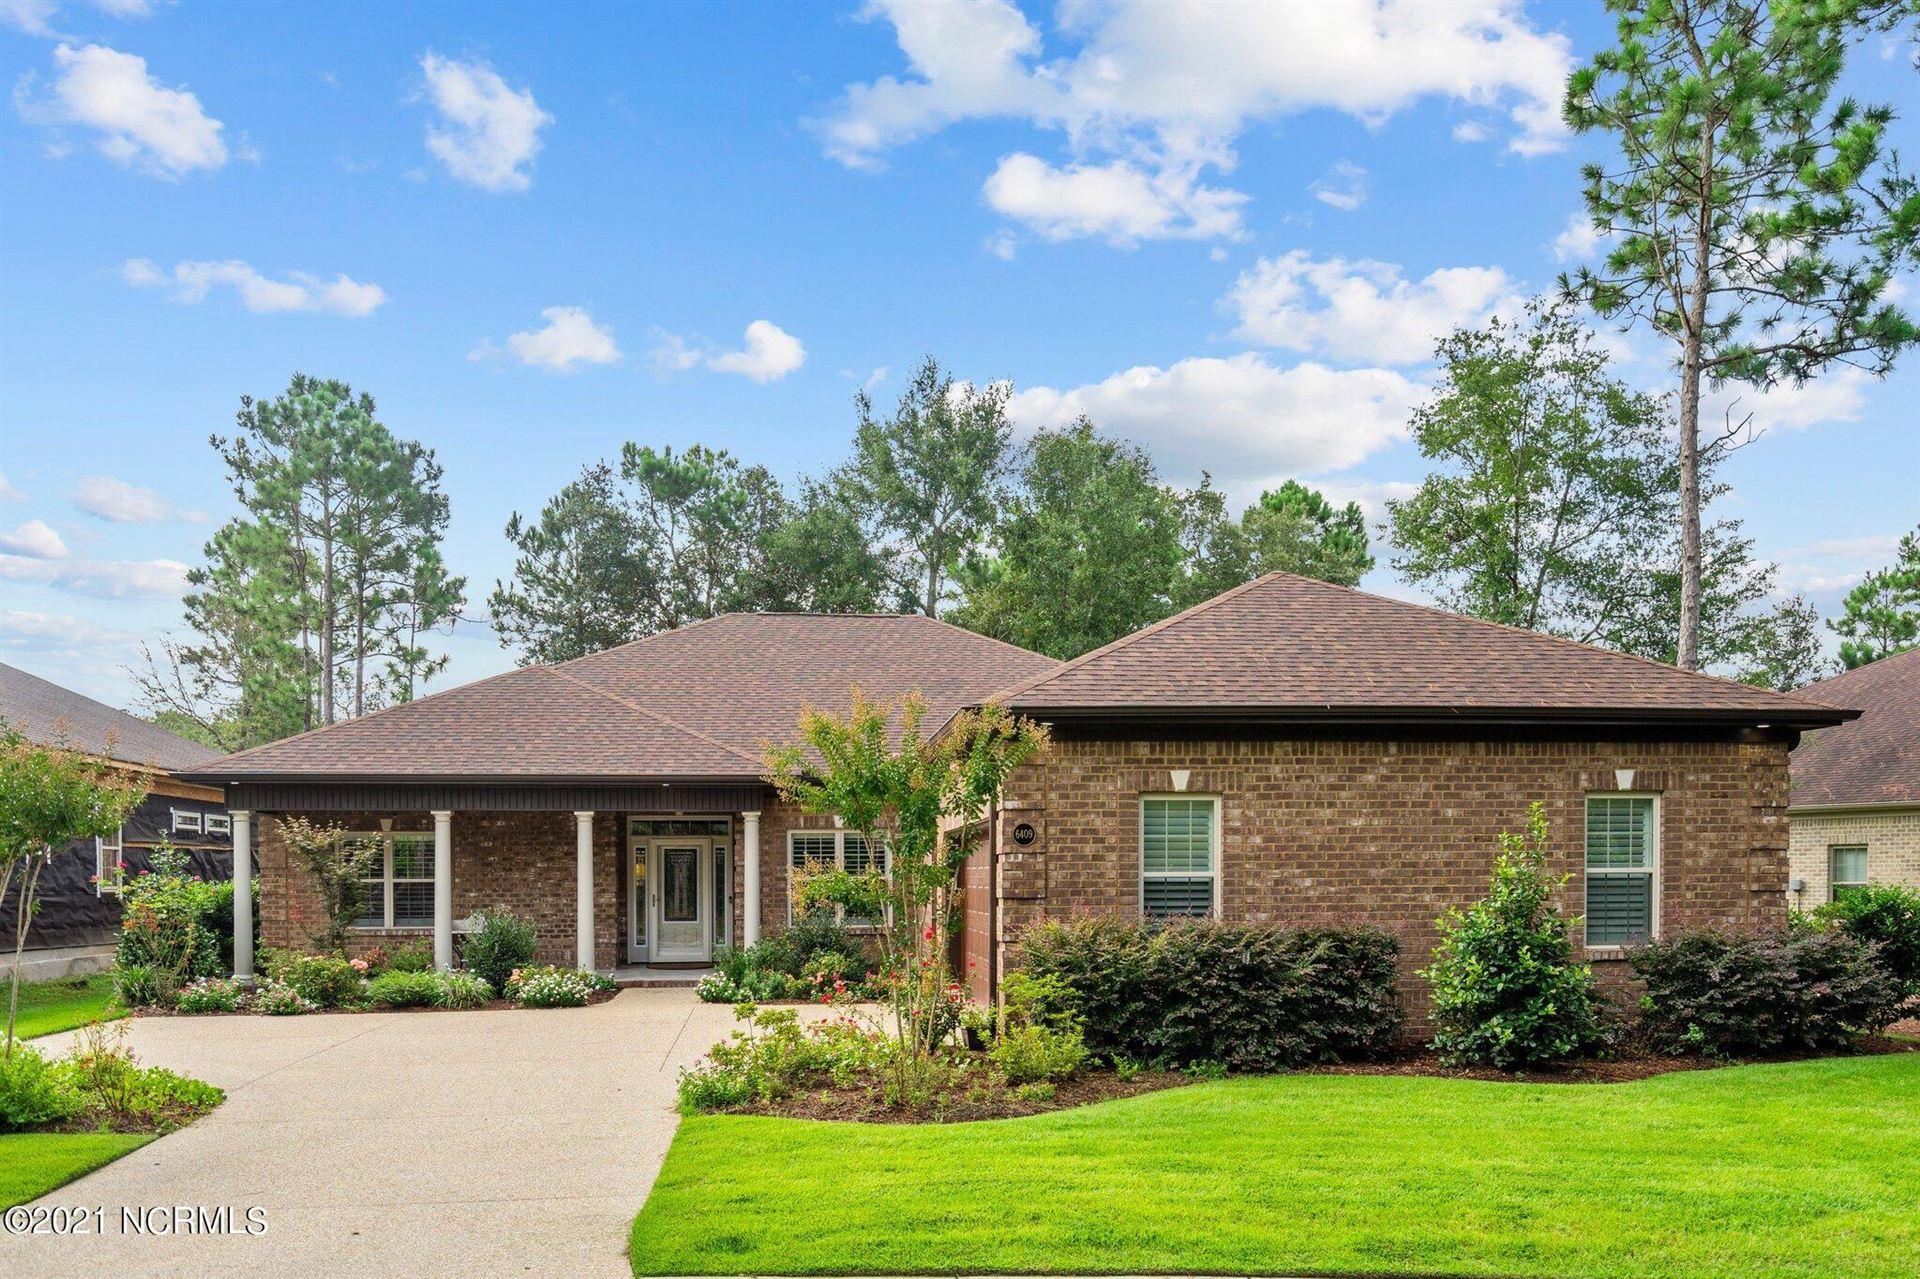 Photo of 6409 Motts Village Road, Wilmington, NC 28412 (MLS # 100292237)